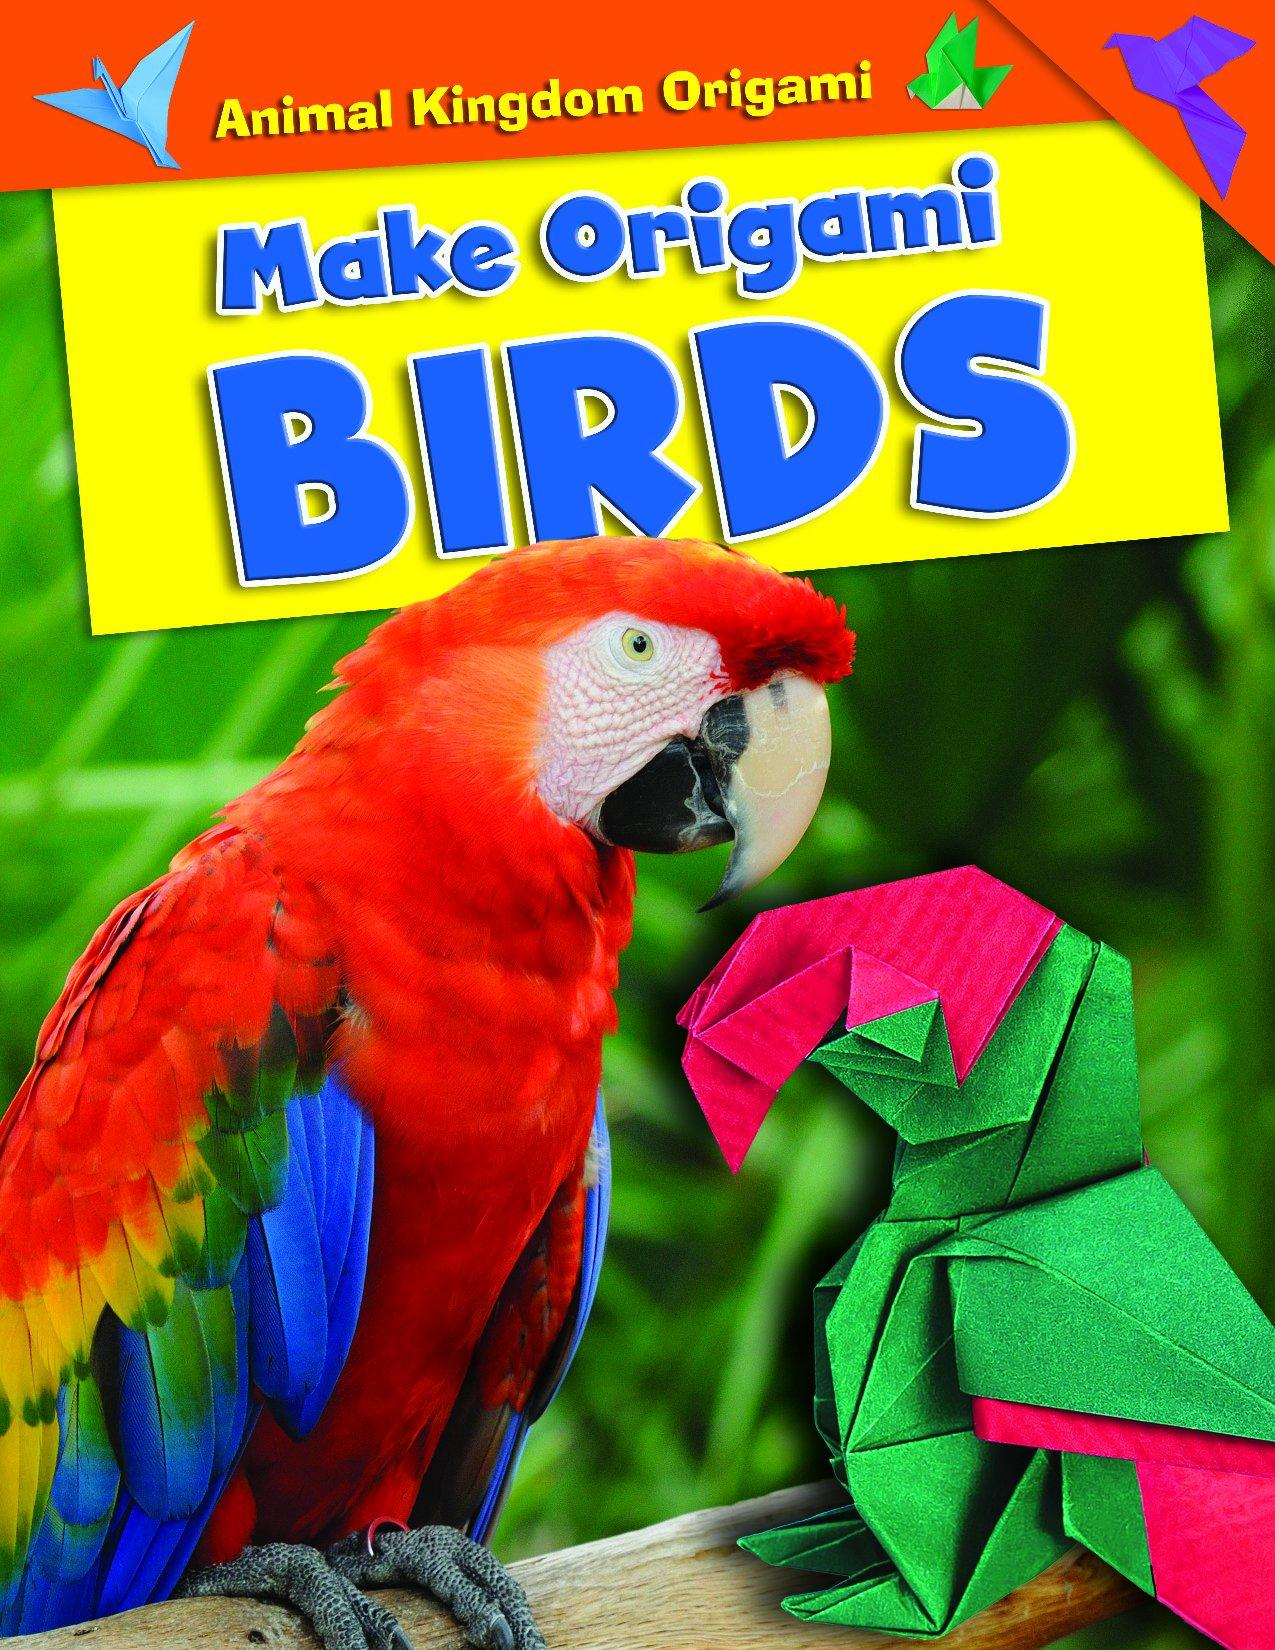 Make Origami Birds Animal Kingdom Ruth Owen Parrot Origamiorigami Macaw Parrotorigami Diagram 9781499433524 Books